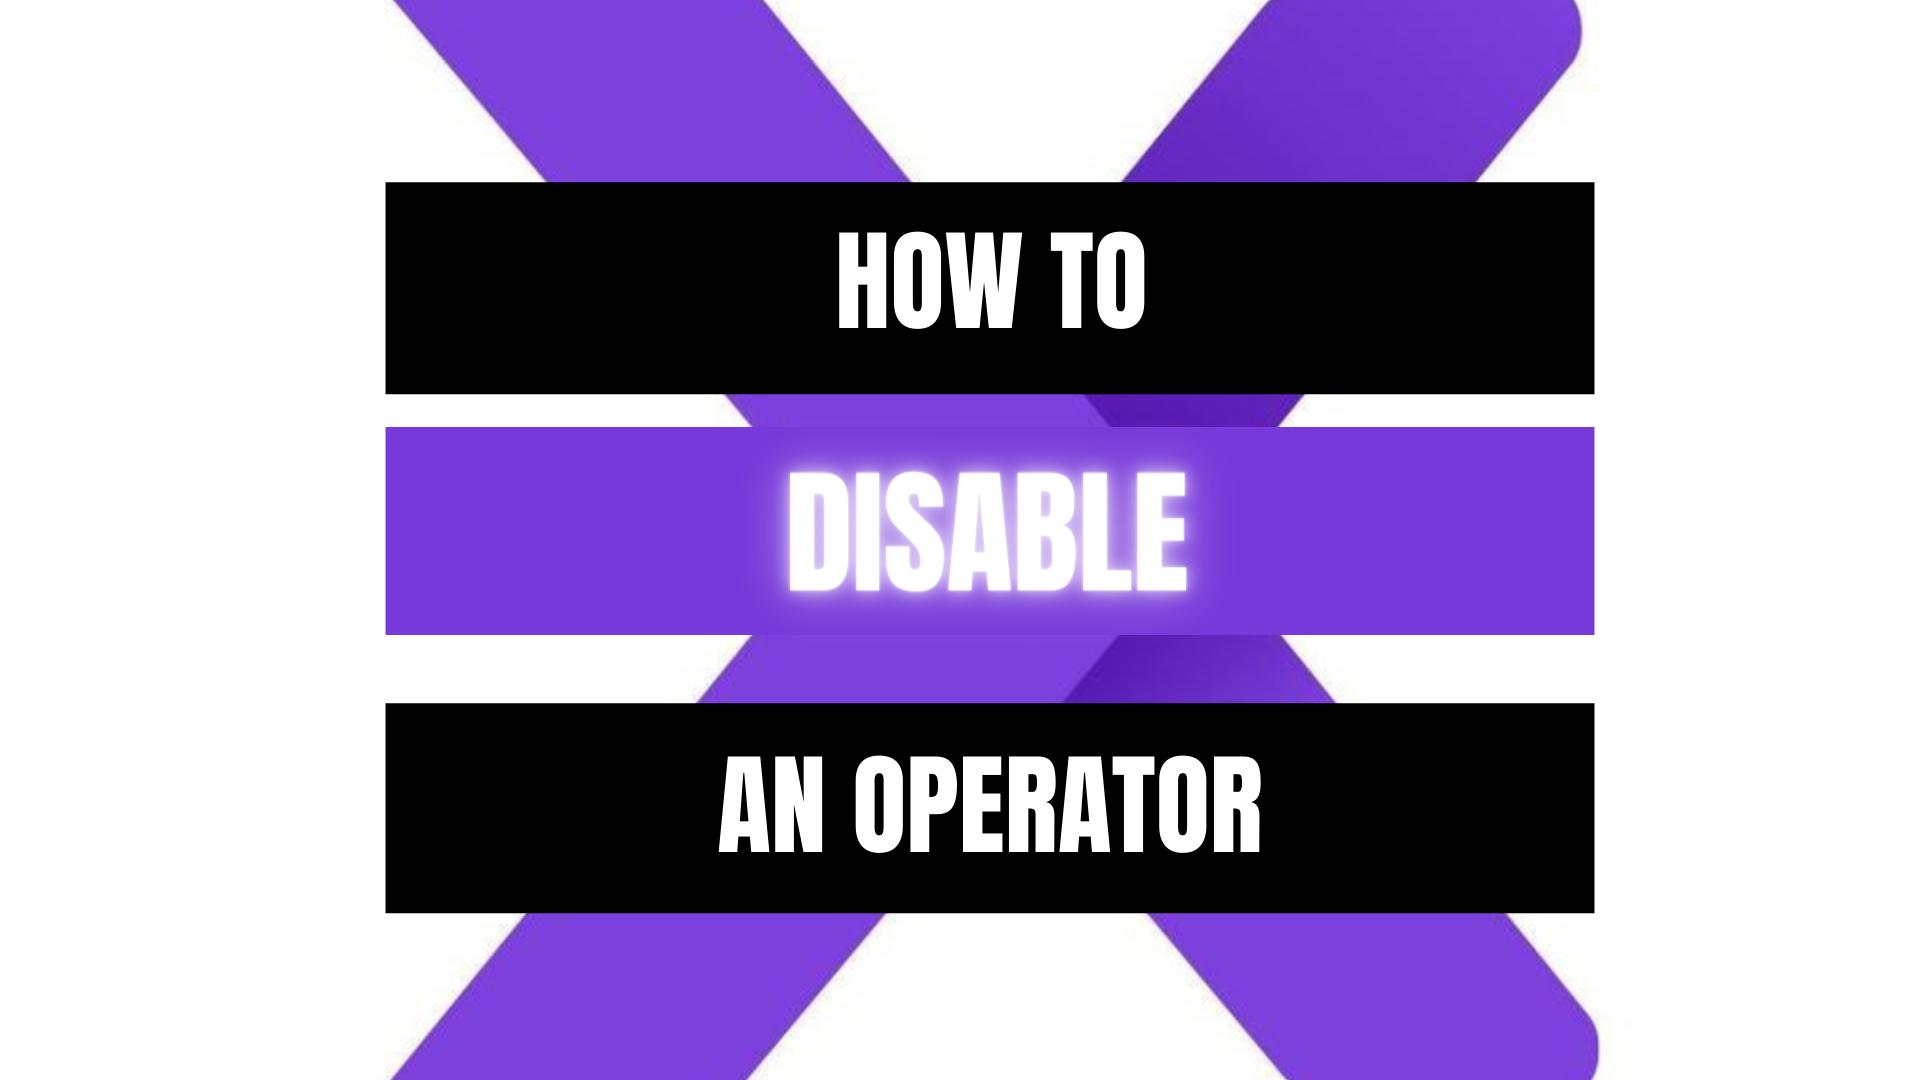 Peekaboox - Disable an Operator